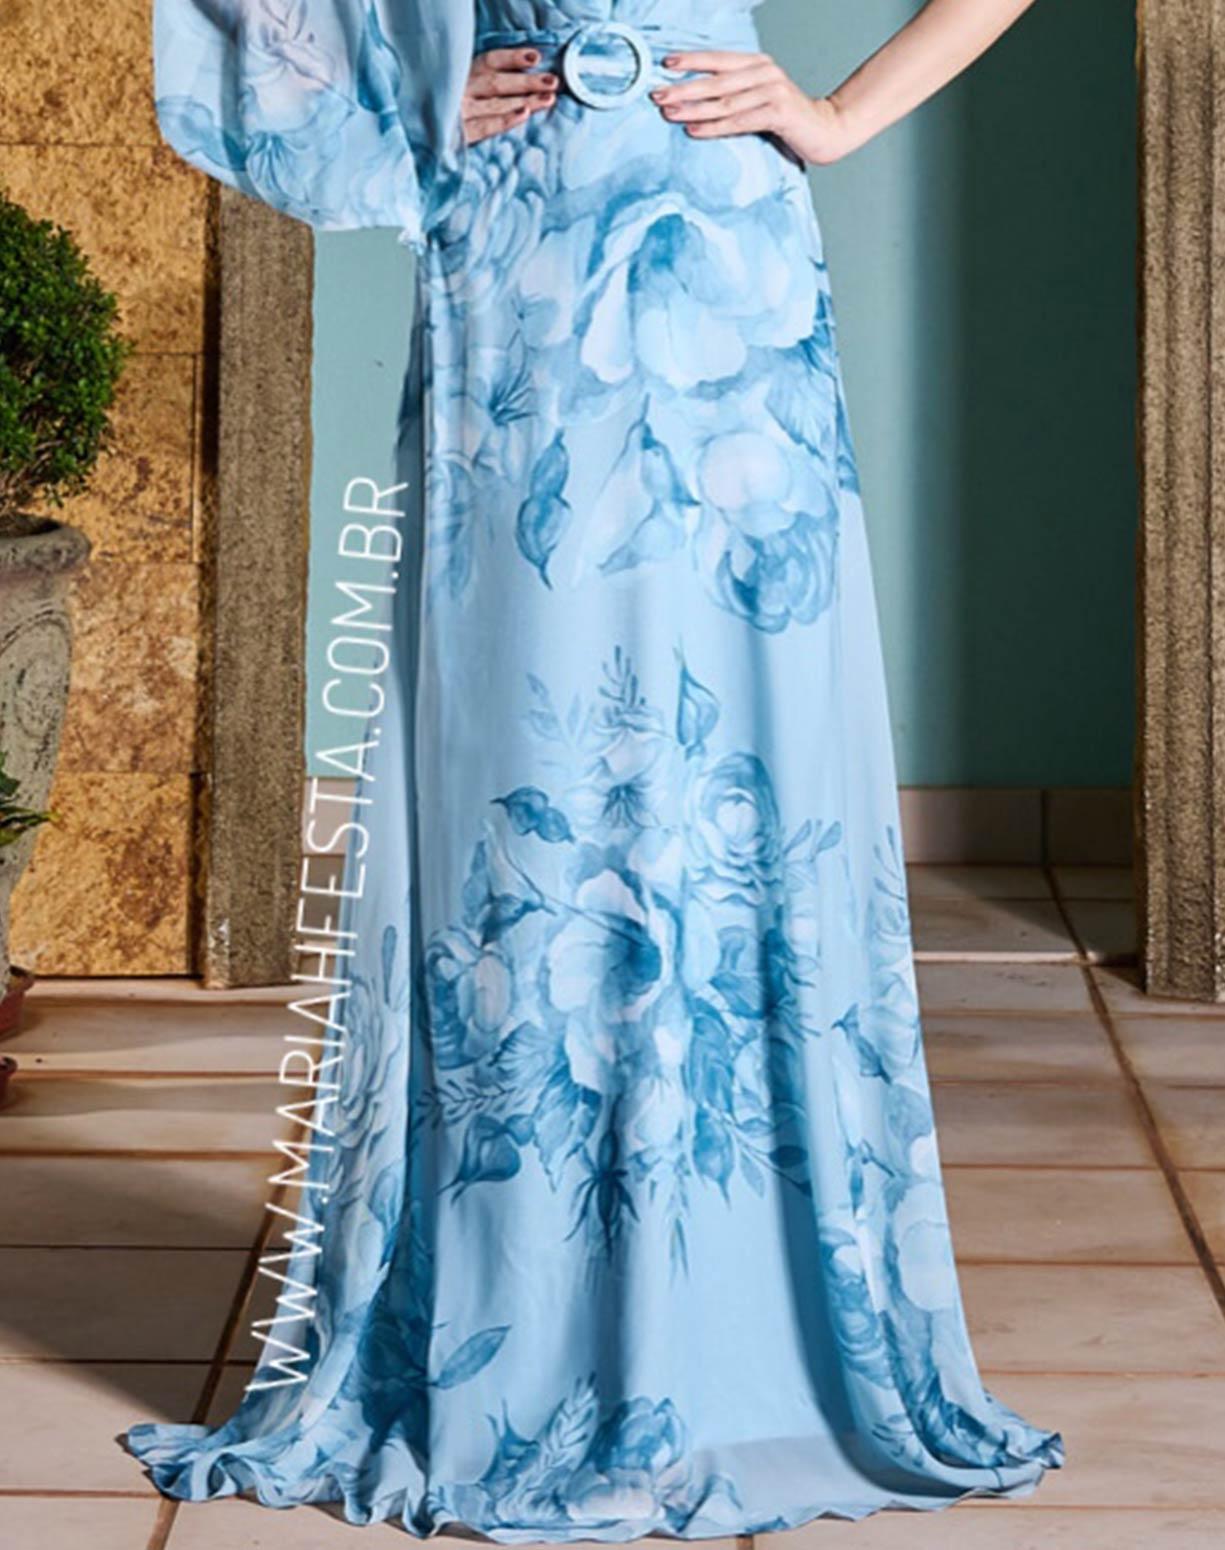 Vestido Floral Serenity de Um Ombro Só e Alça de Amarrar